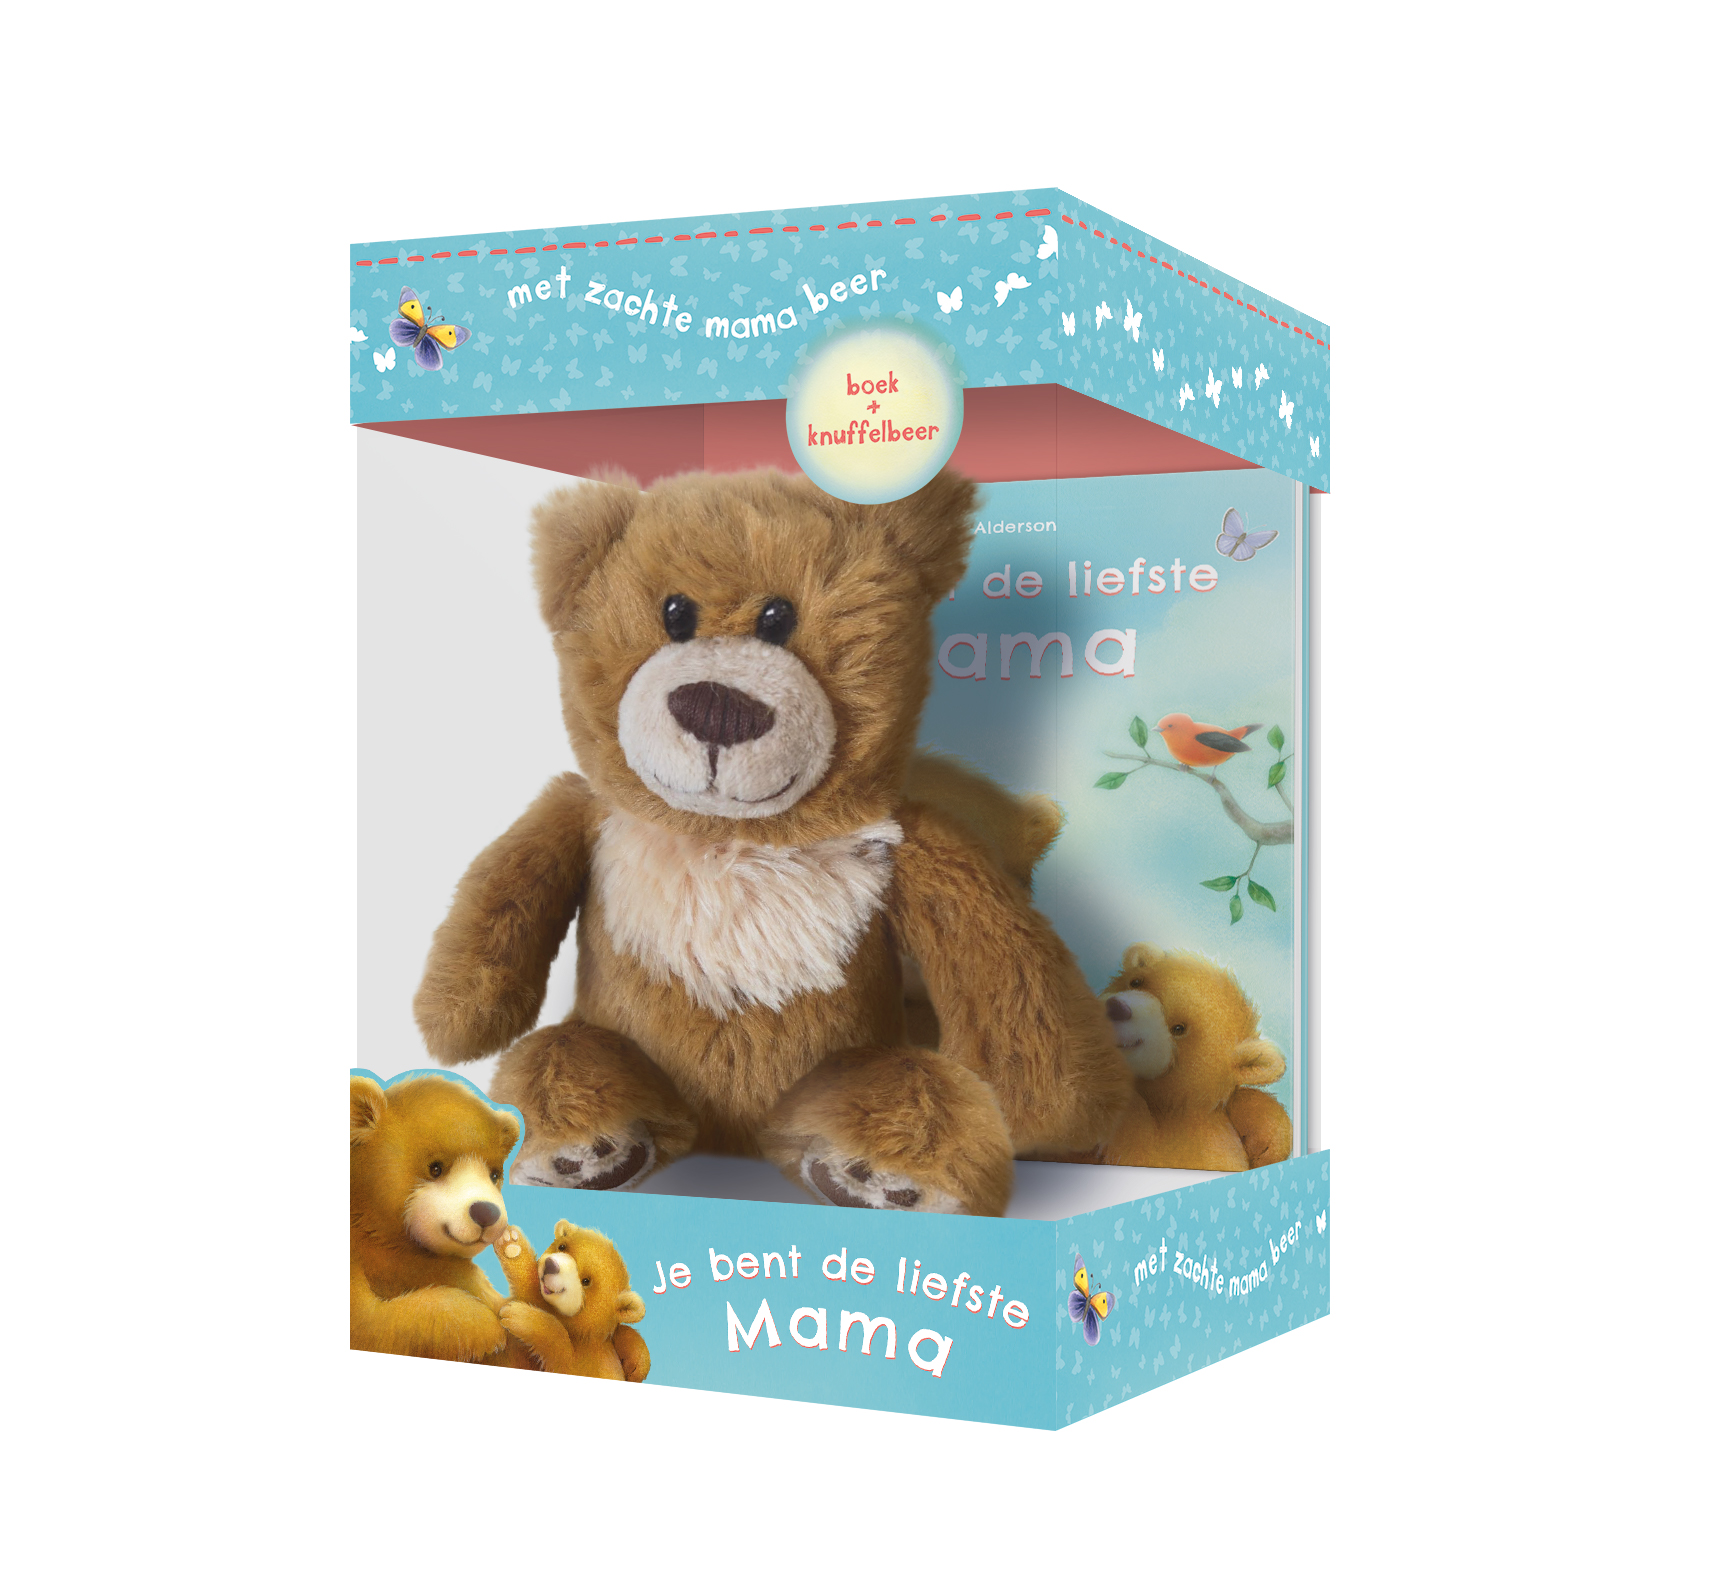 Liefste mama - boek & knuffelbeer